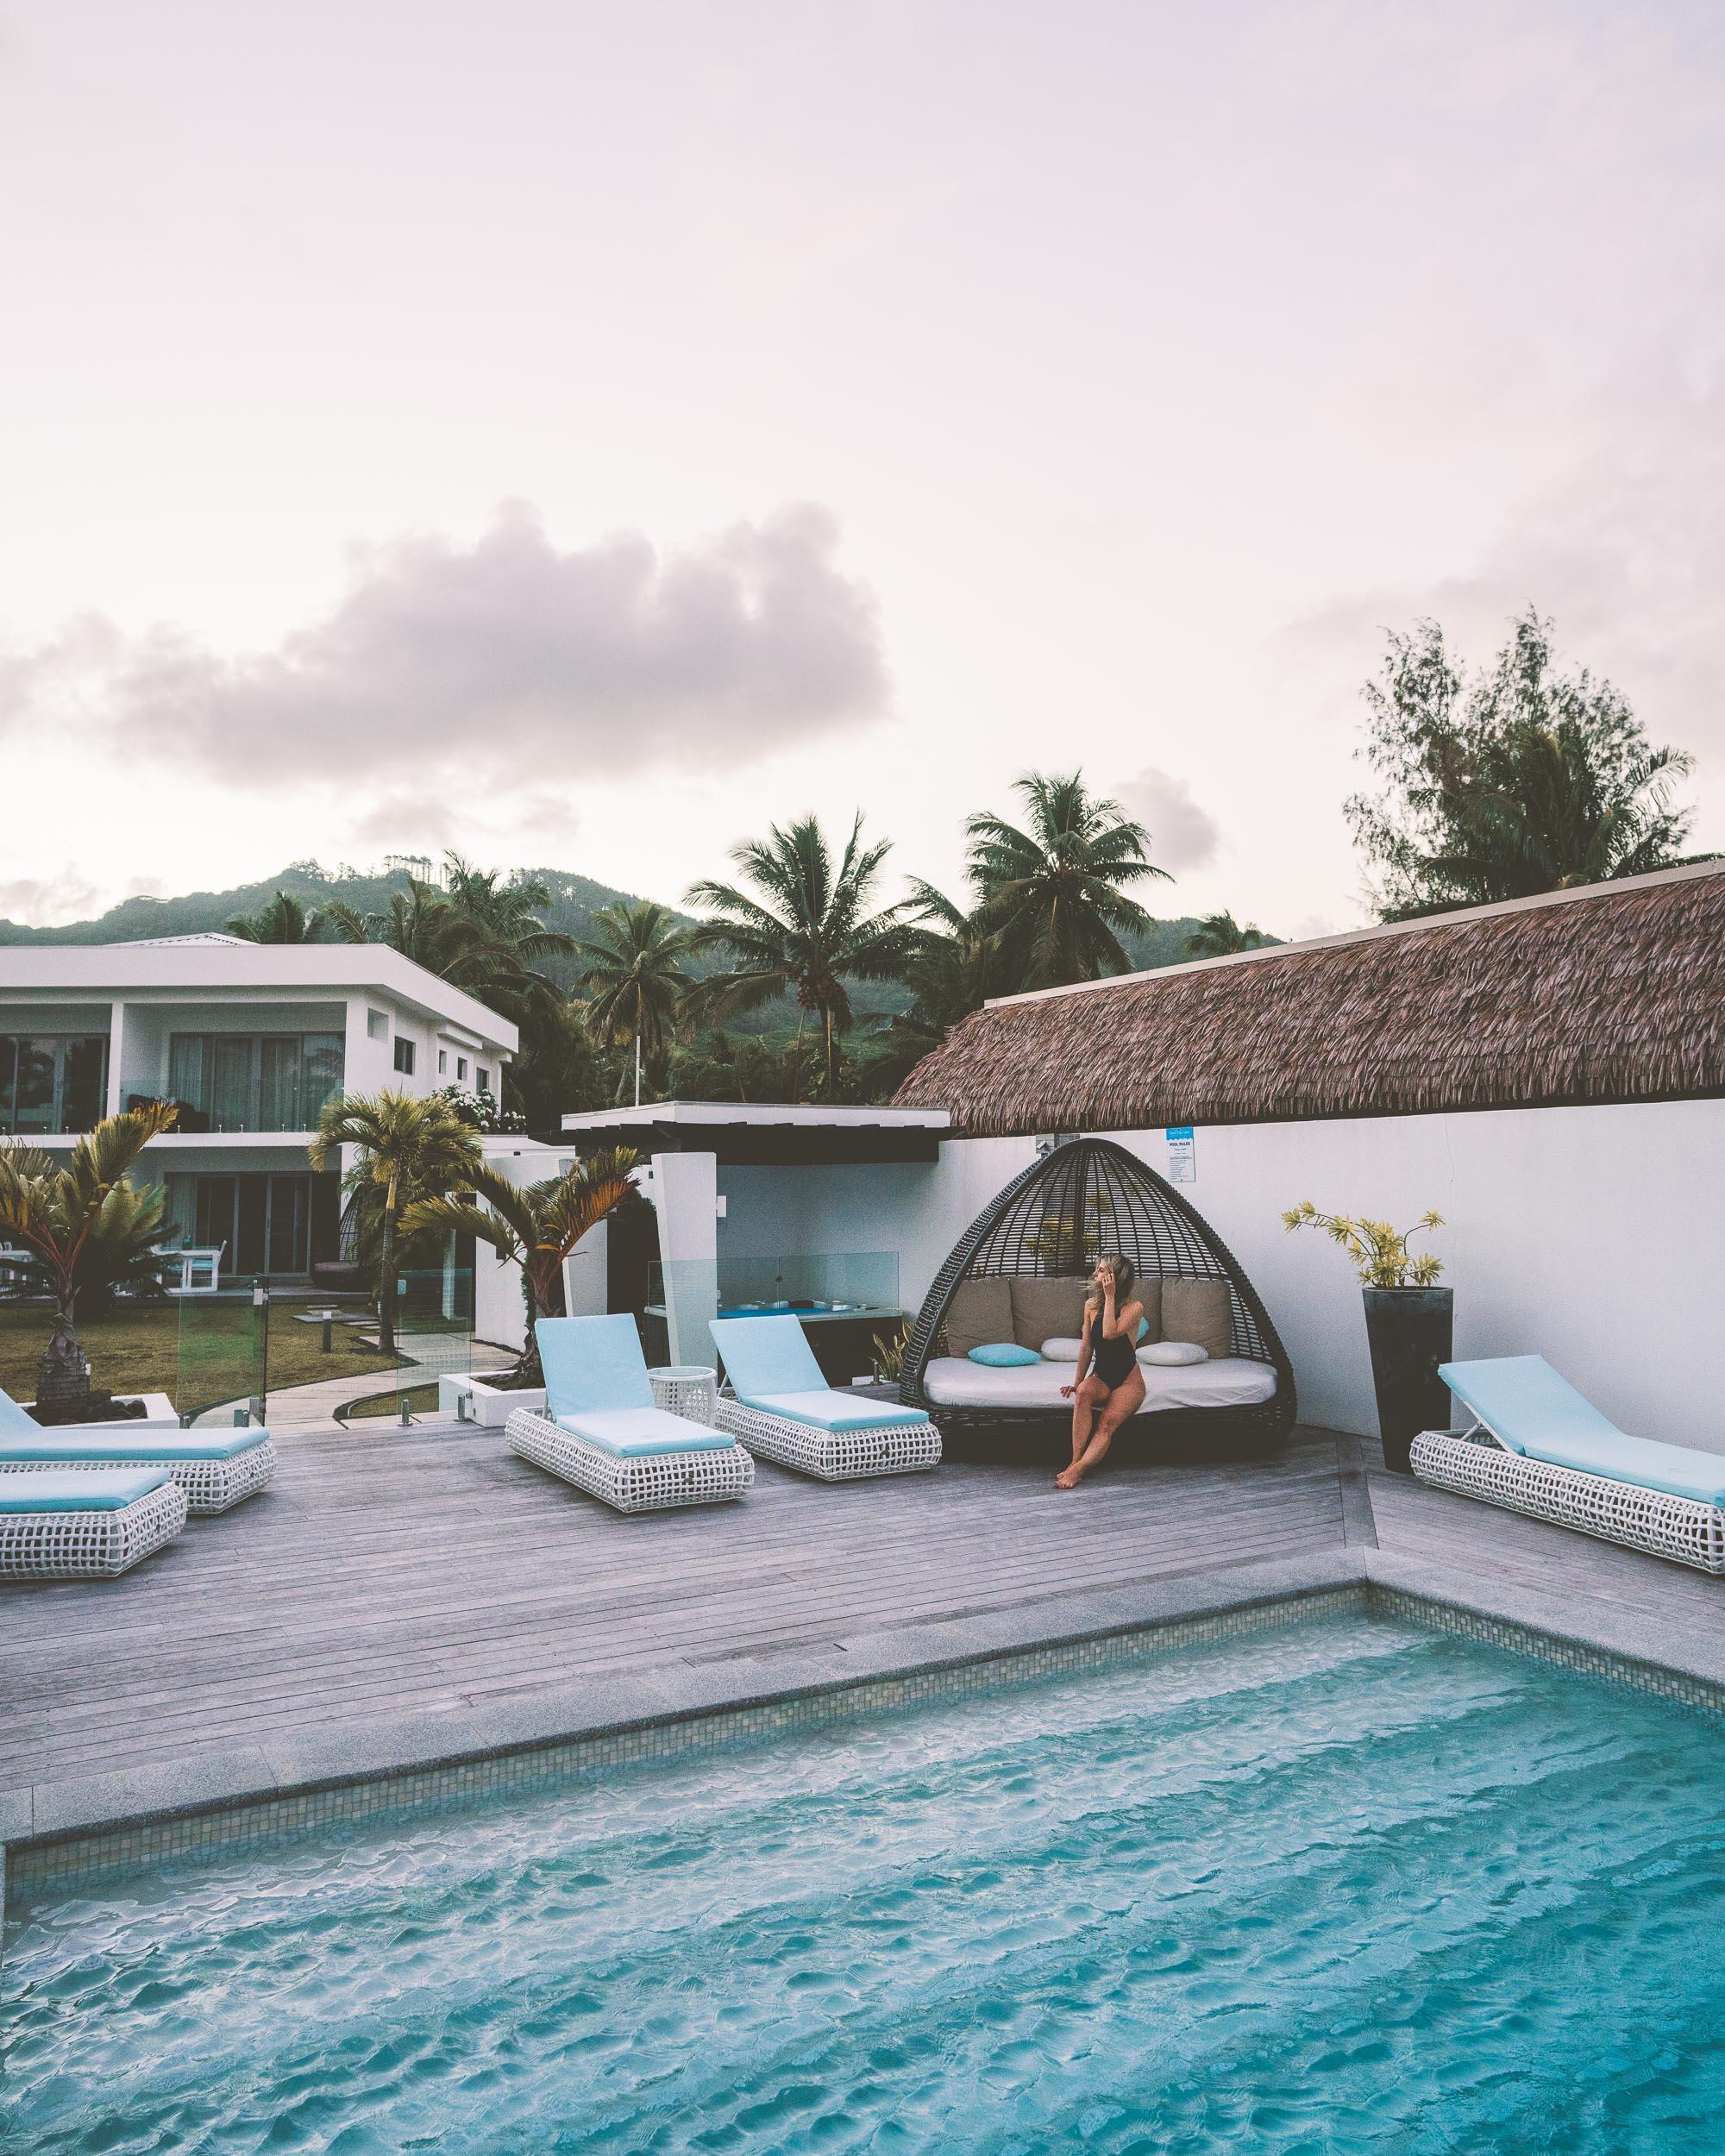 The pool at Crystal Blue Lagoon villas in Rarotonga, Cook Islands